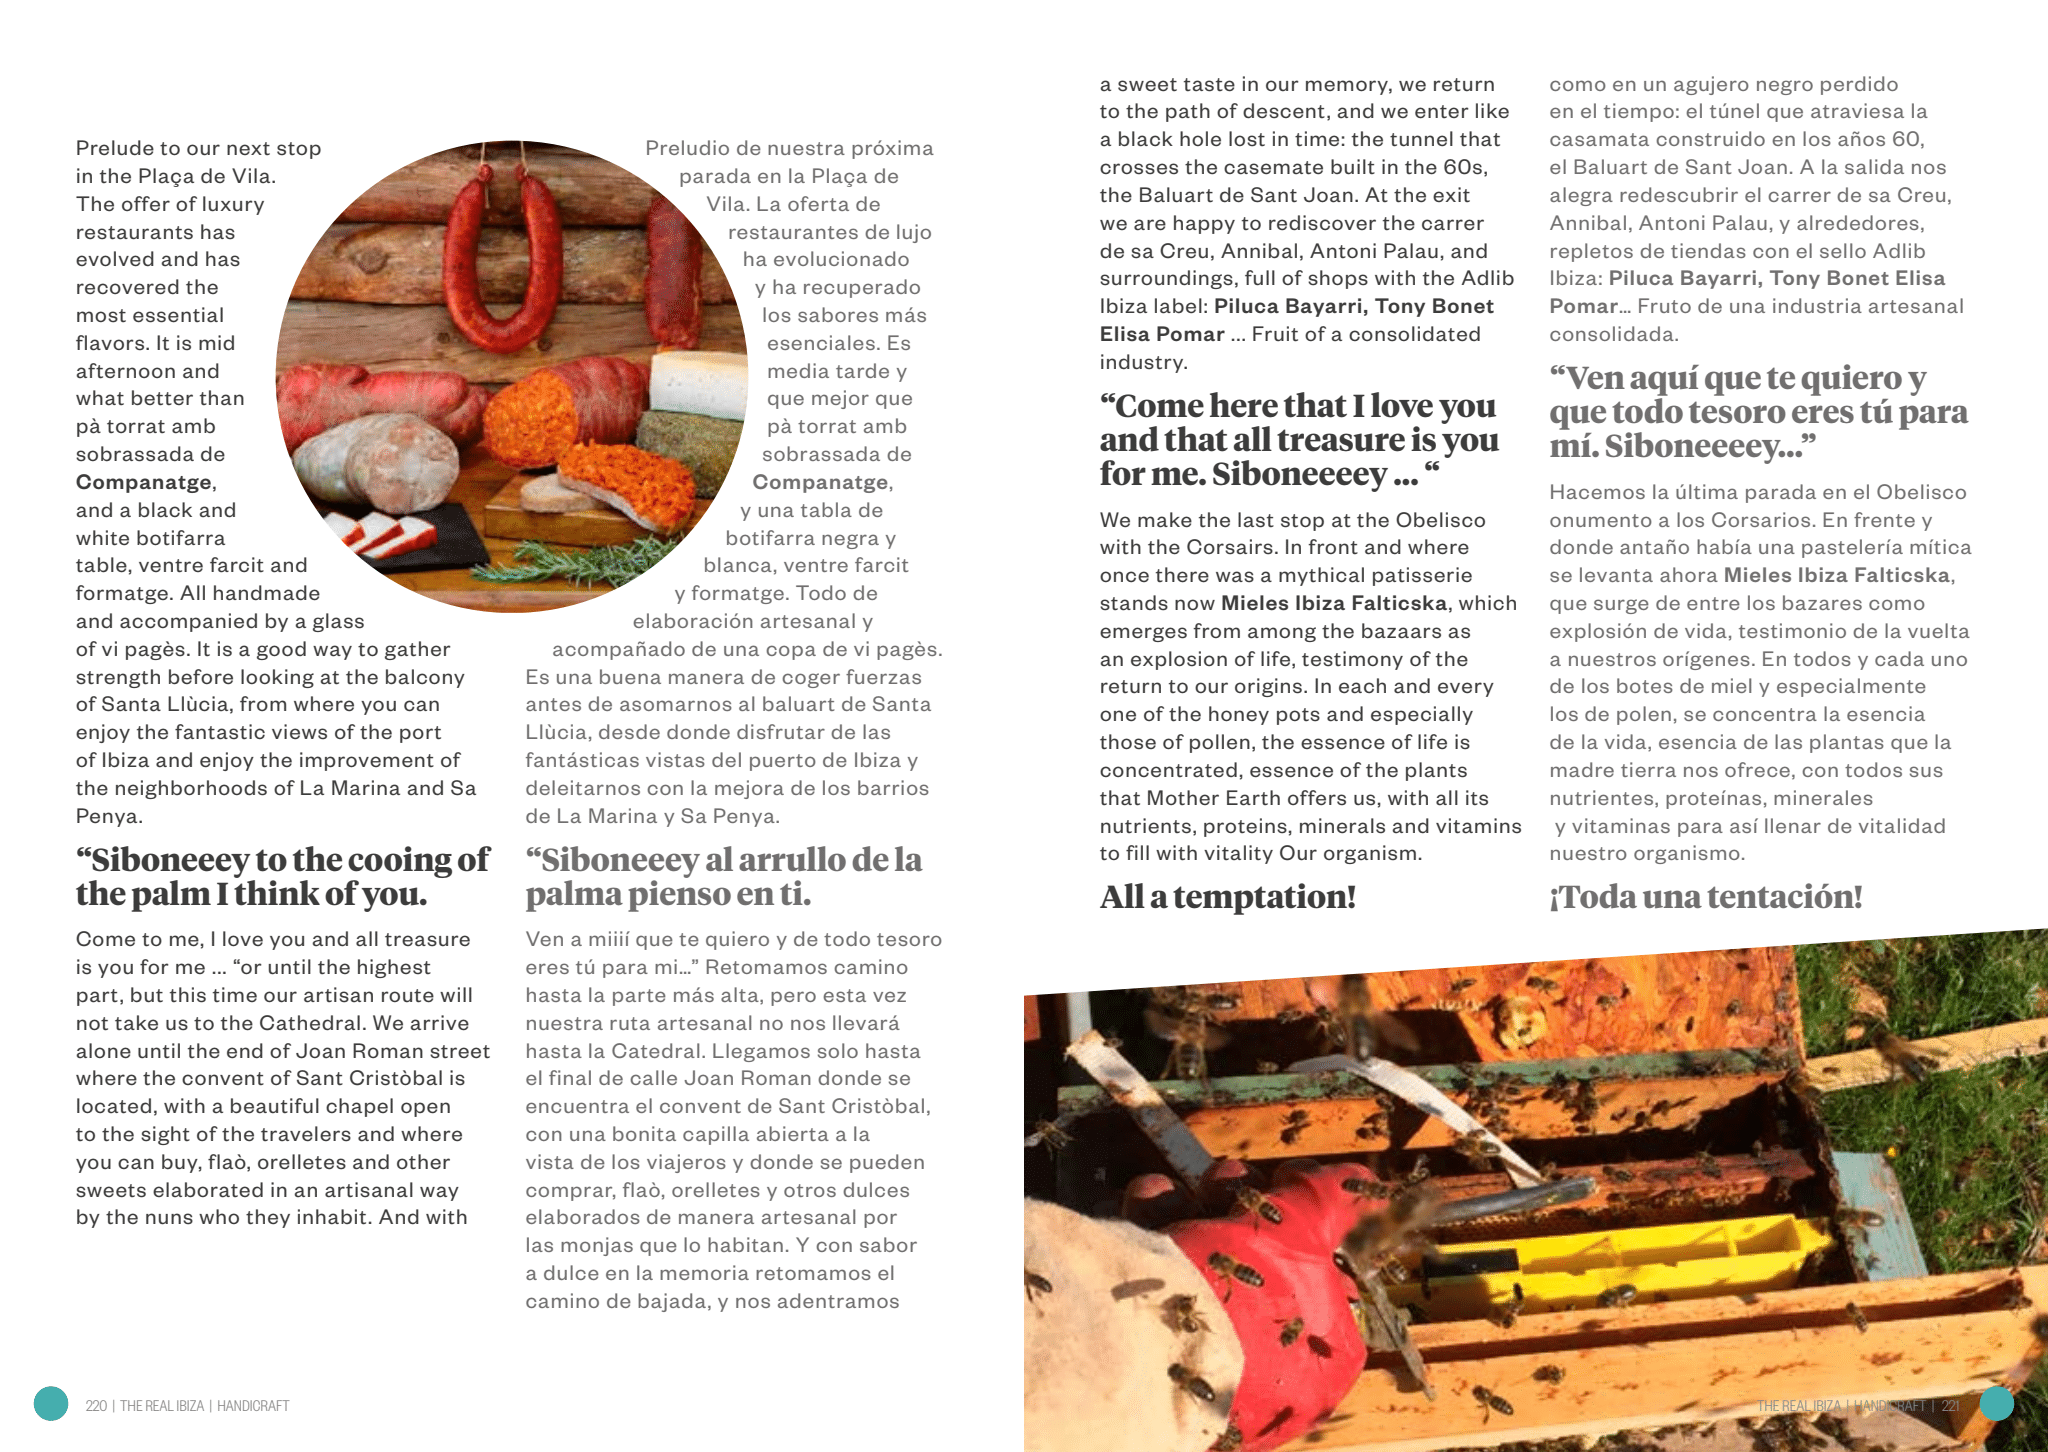 The Real Ibiza. Interview with Handycraft. Entrevista con Handycraft